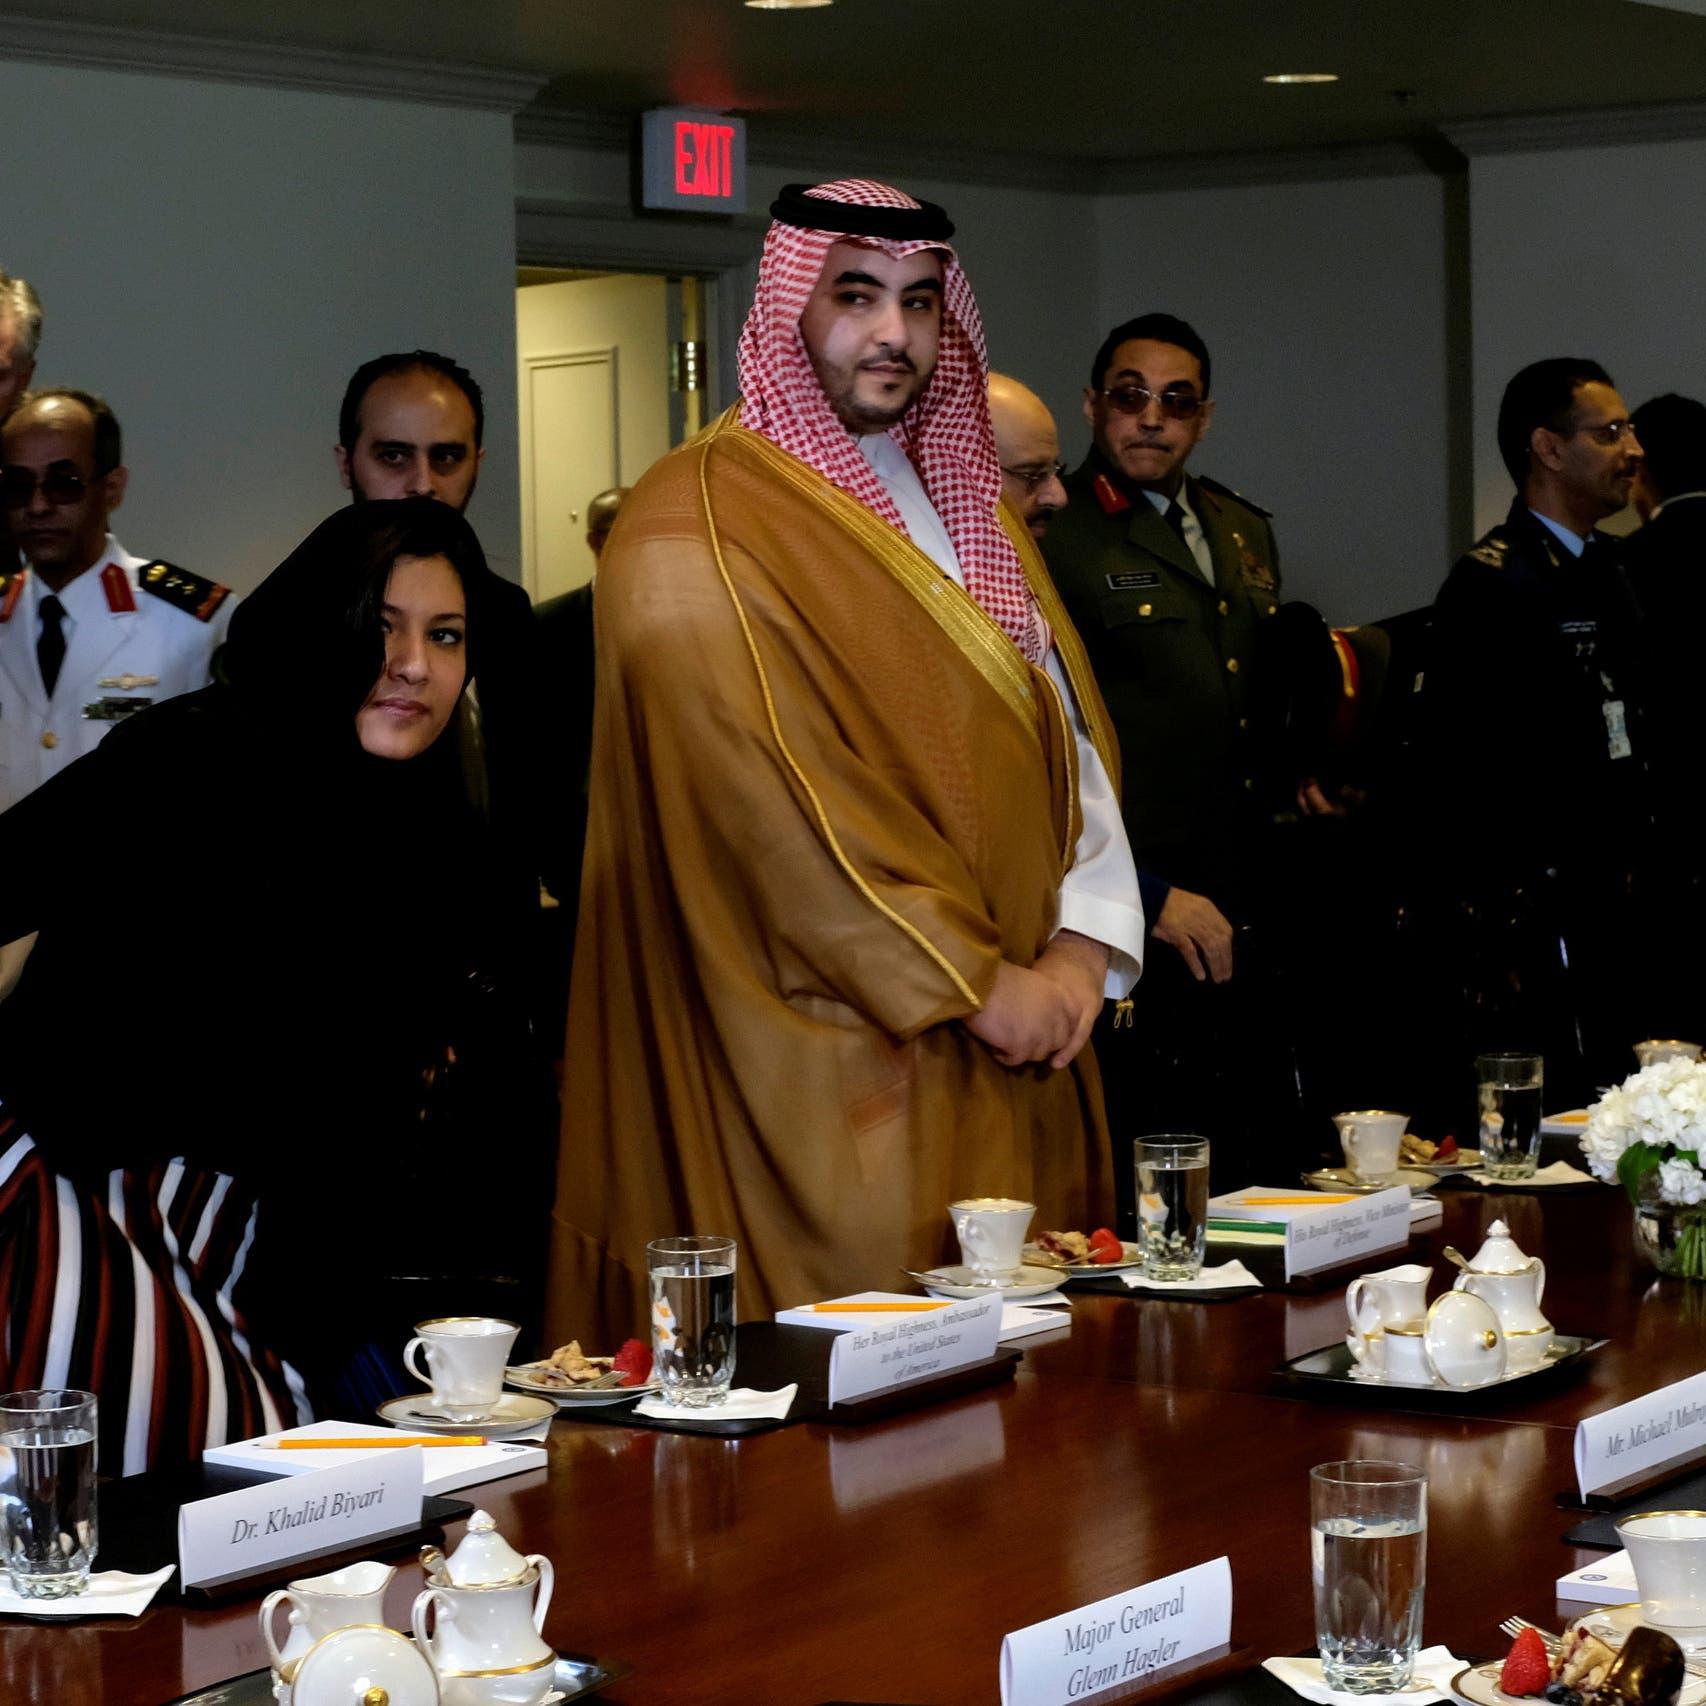 Riyadh and Washington: Pragmatism and other subjects